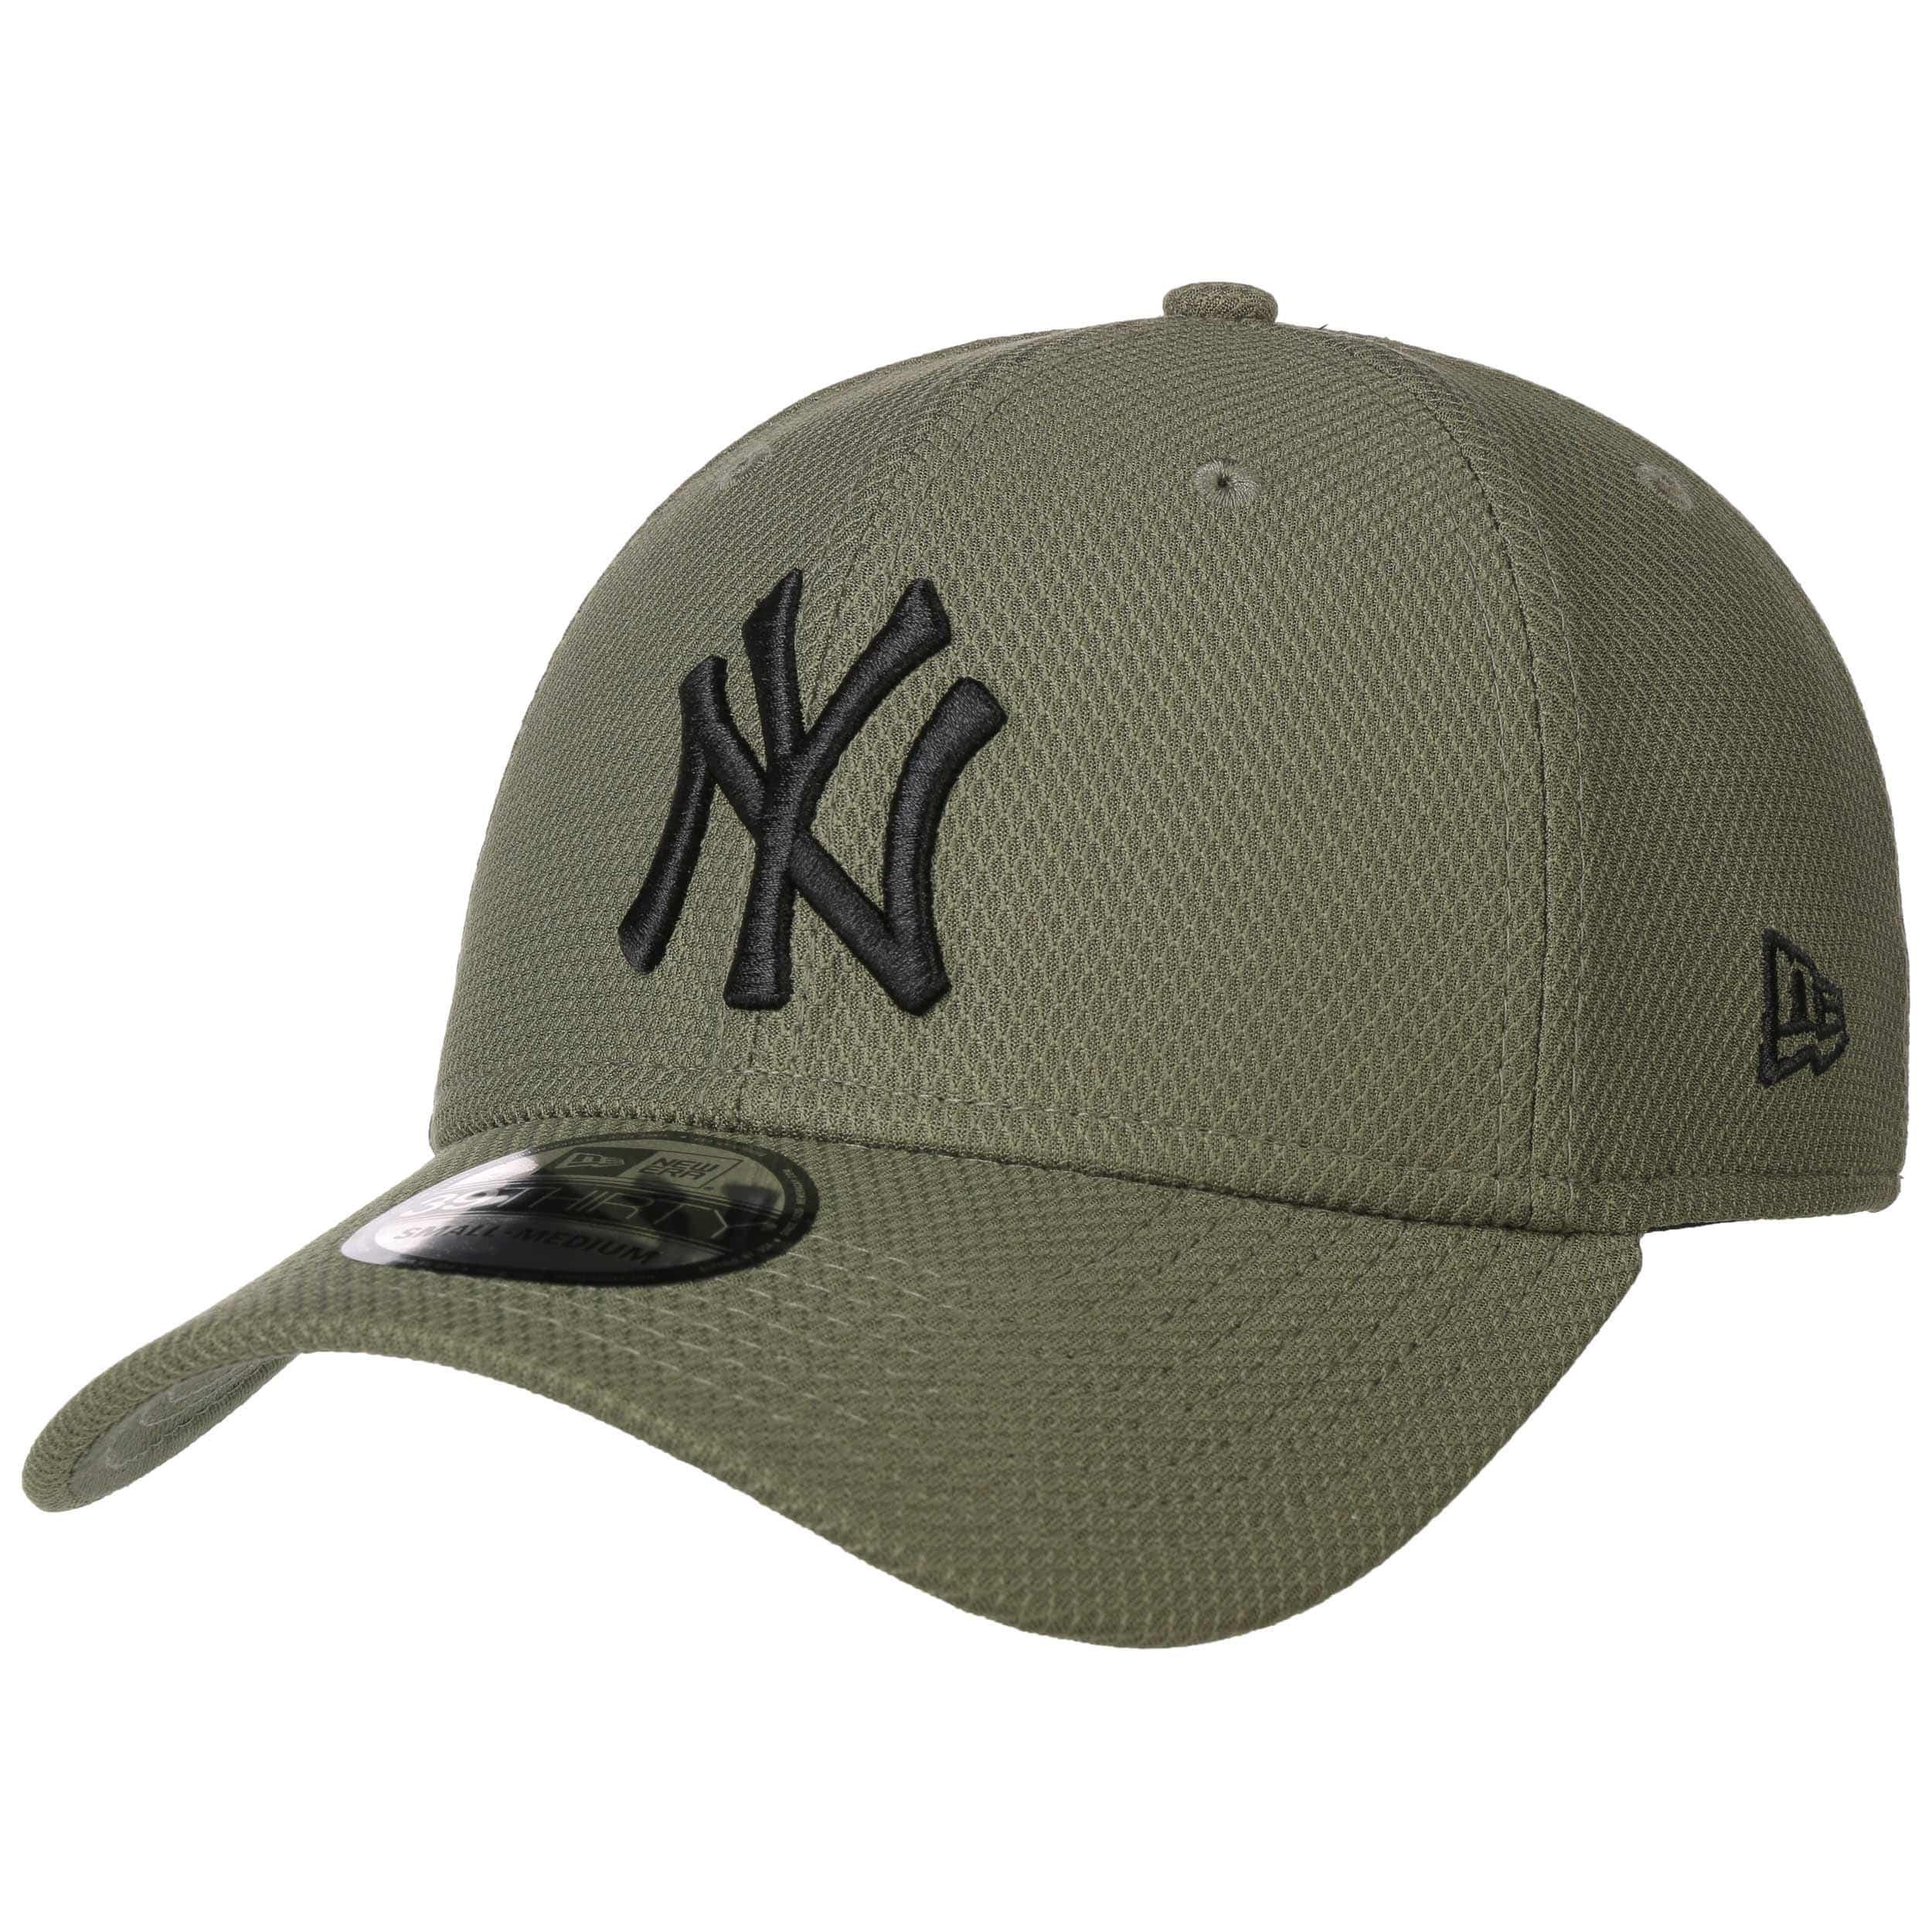 2a7c7cc1953 ... 39Thirty Diamond Era Yankees Cap by New Era - olive 6